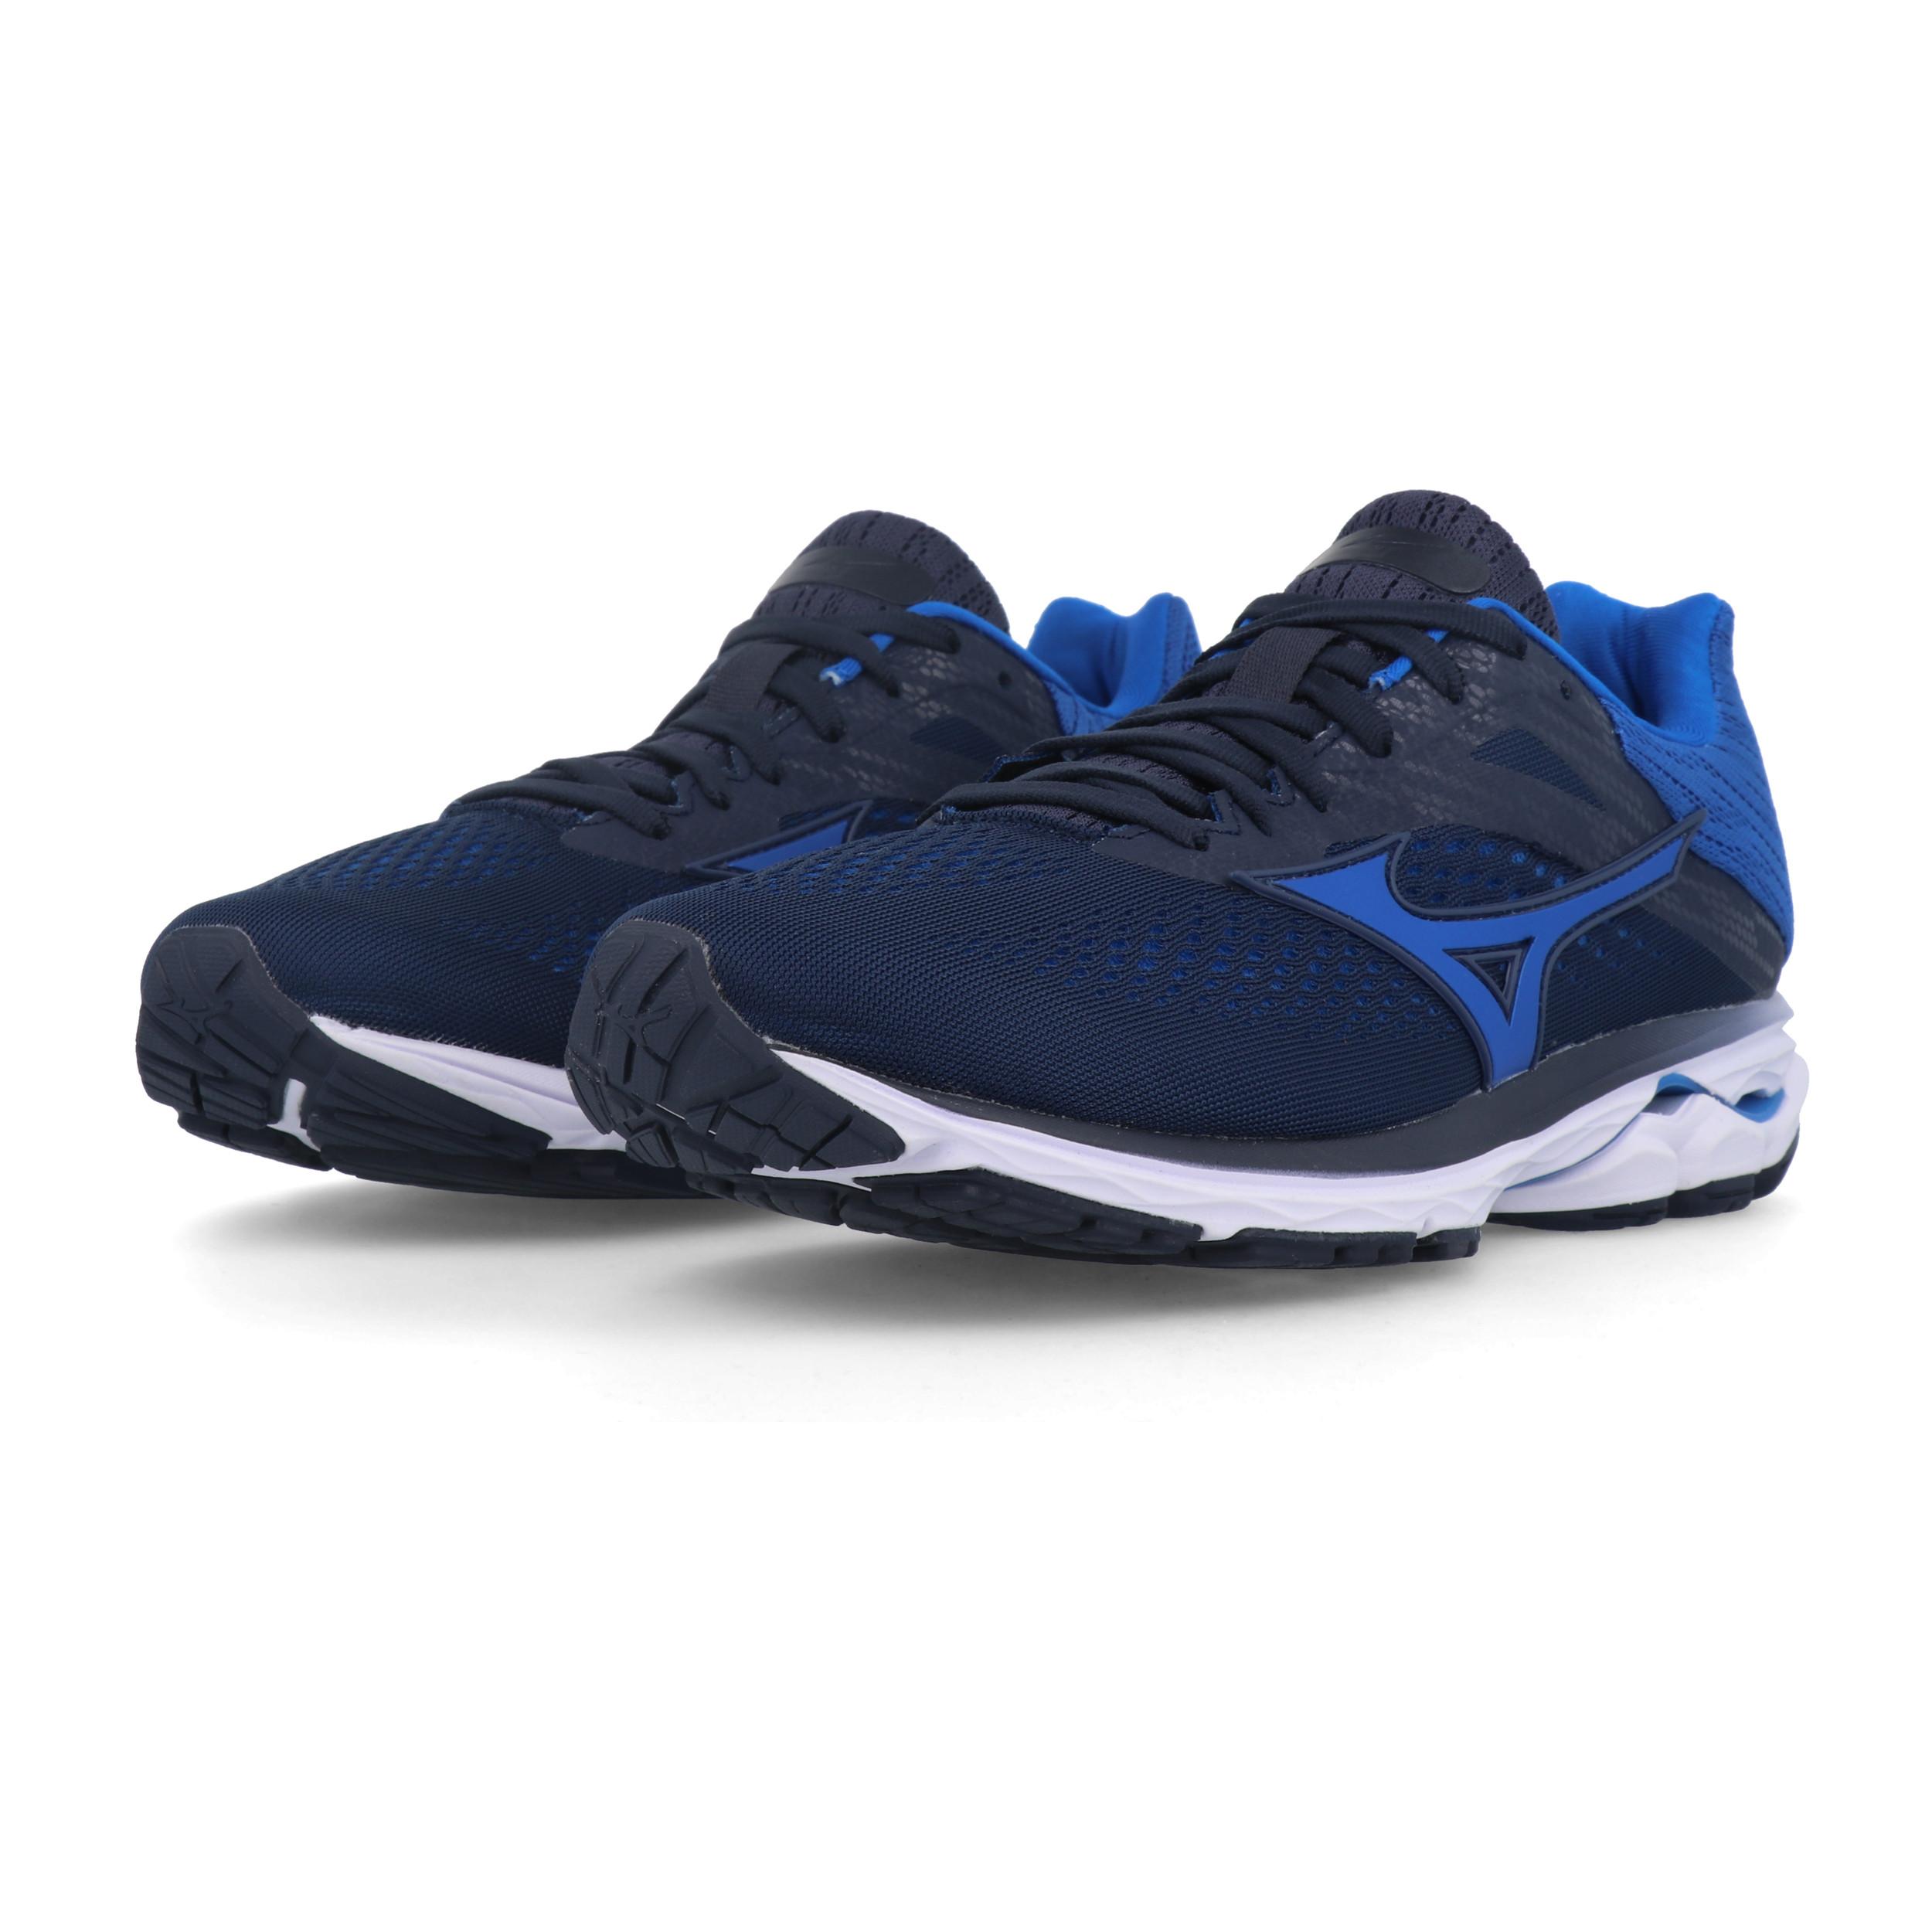 Mizuno Wave Rider 23 Running Shoes - SS20